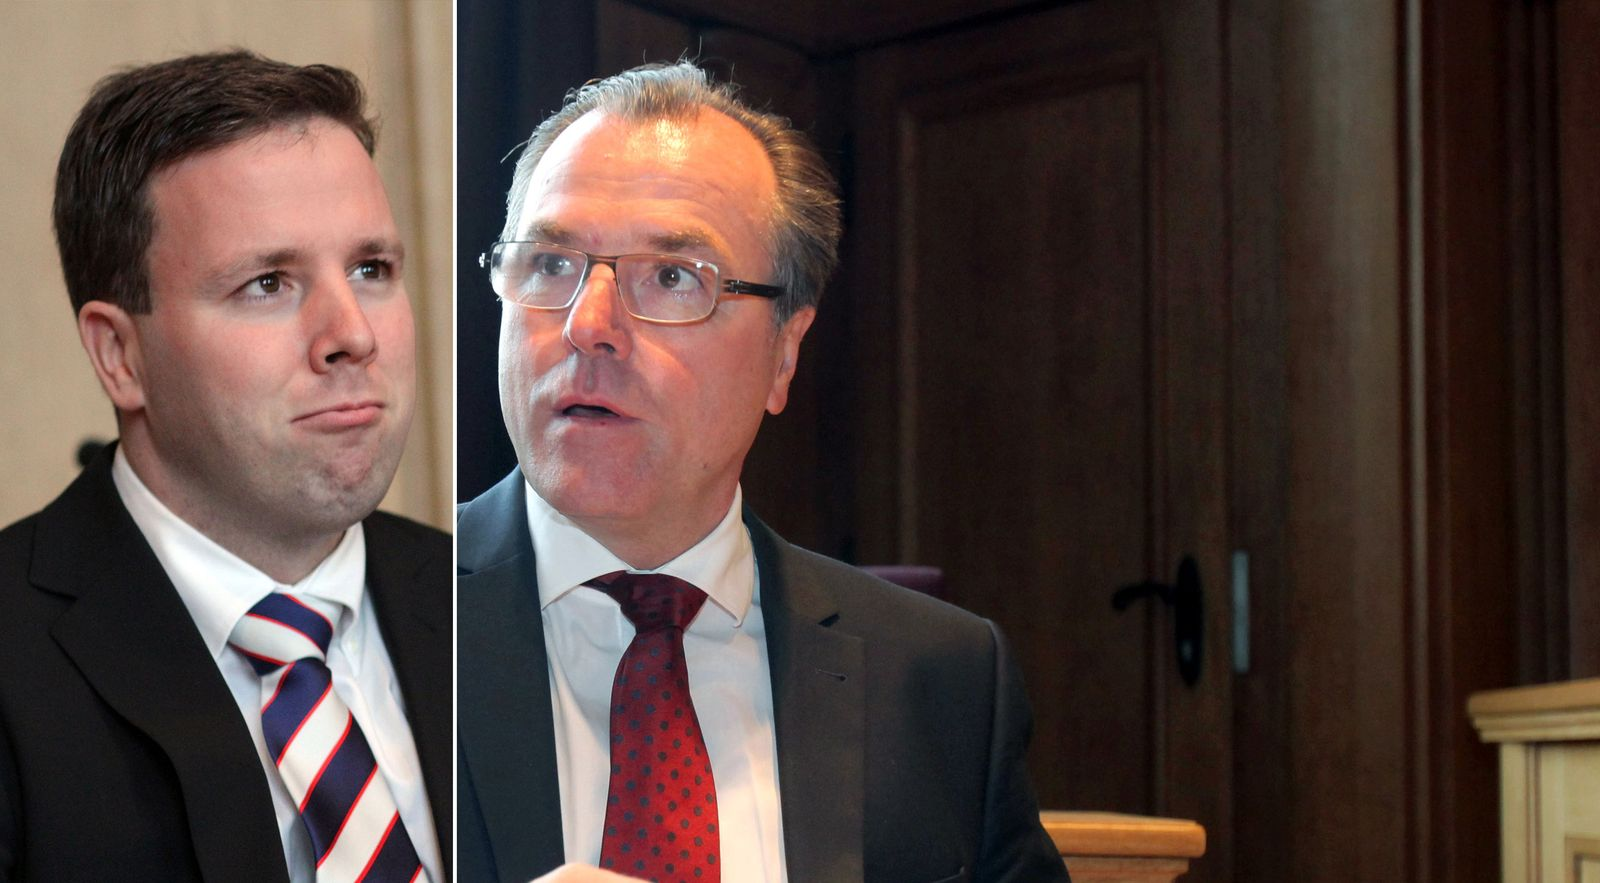 KOMBO Robert und Clemens Tönnies